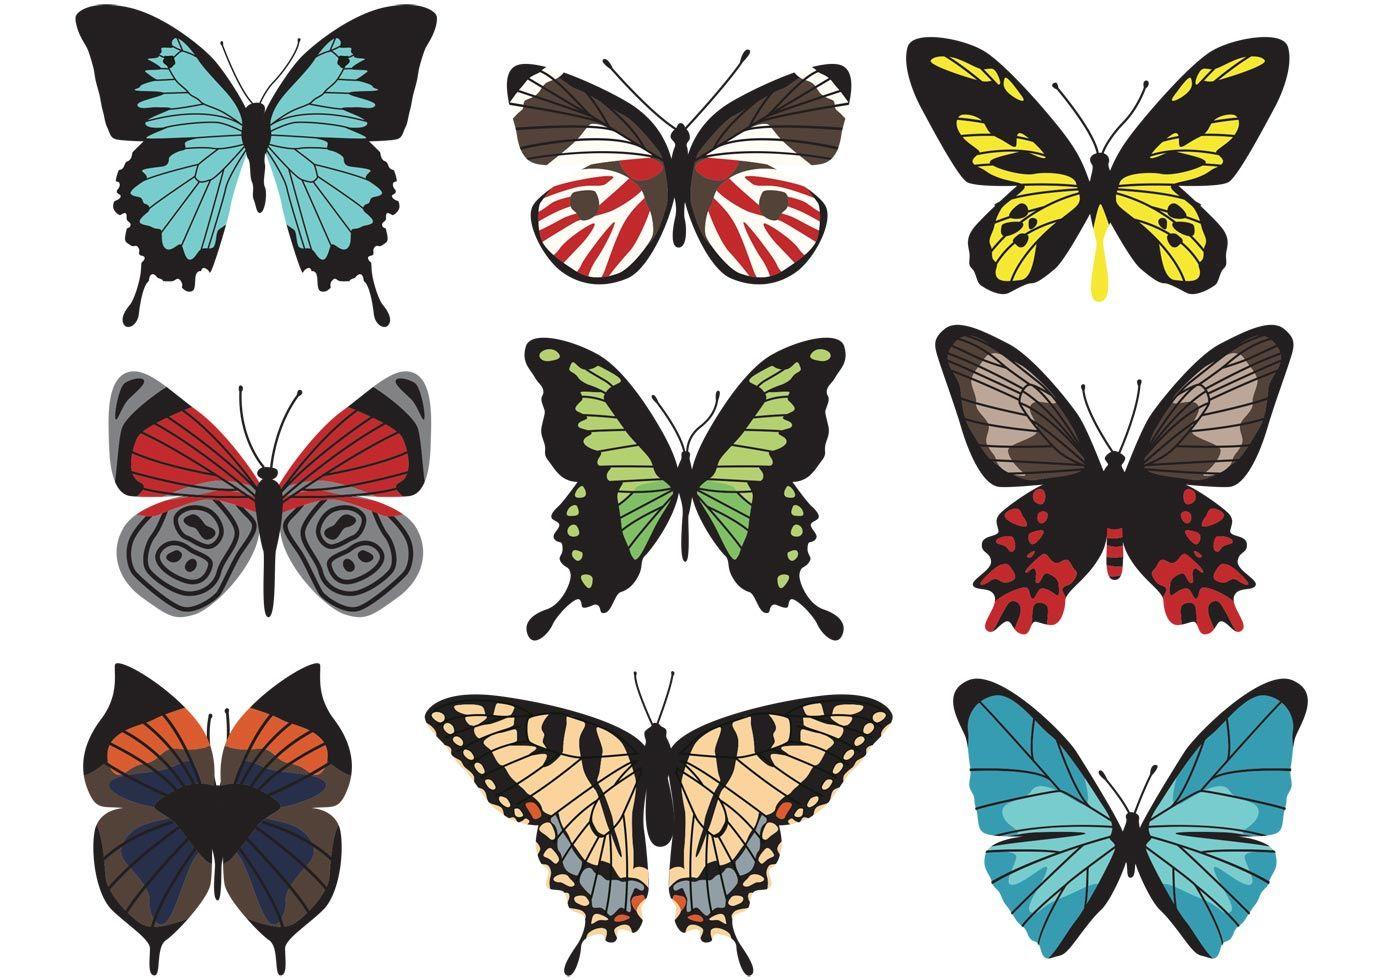 Butterfly Vectors Vector Art Butterflies Vector Butterfly Drawing Images